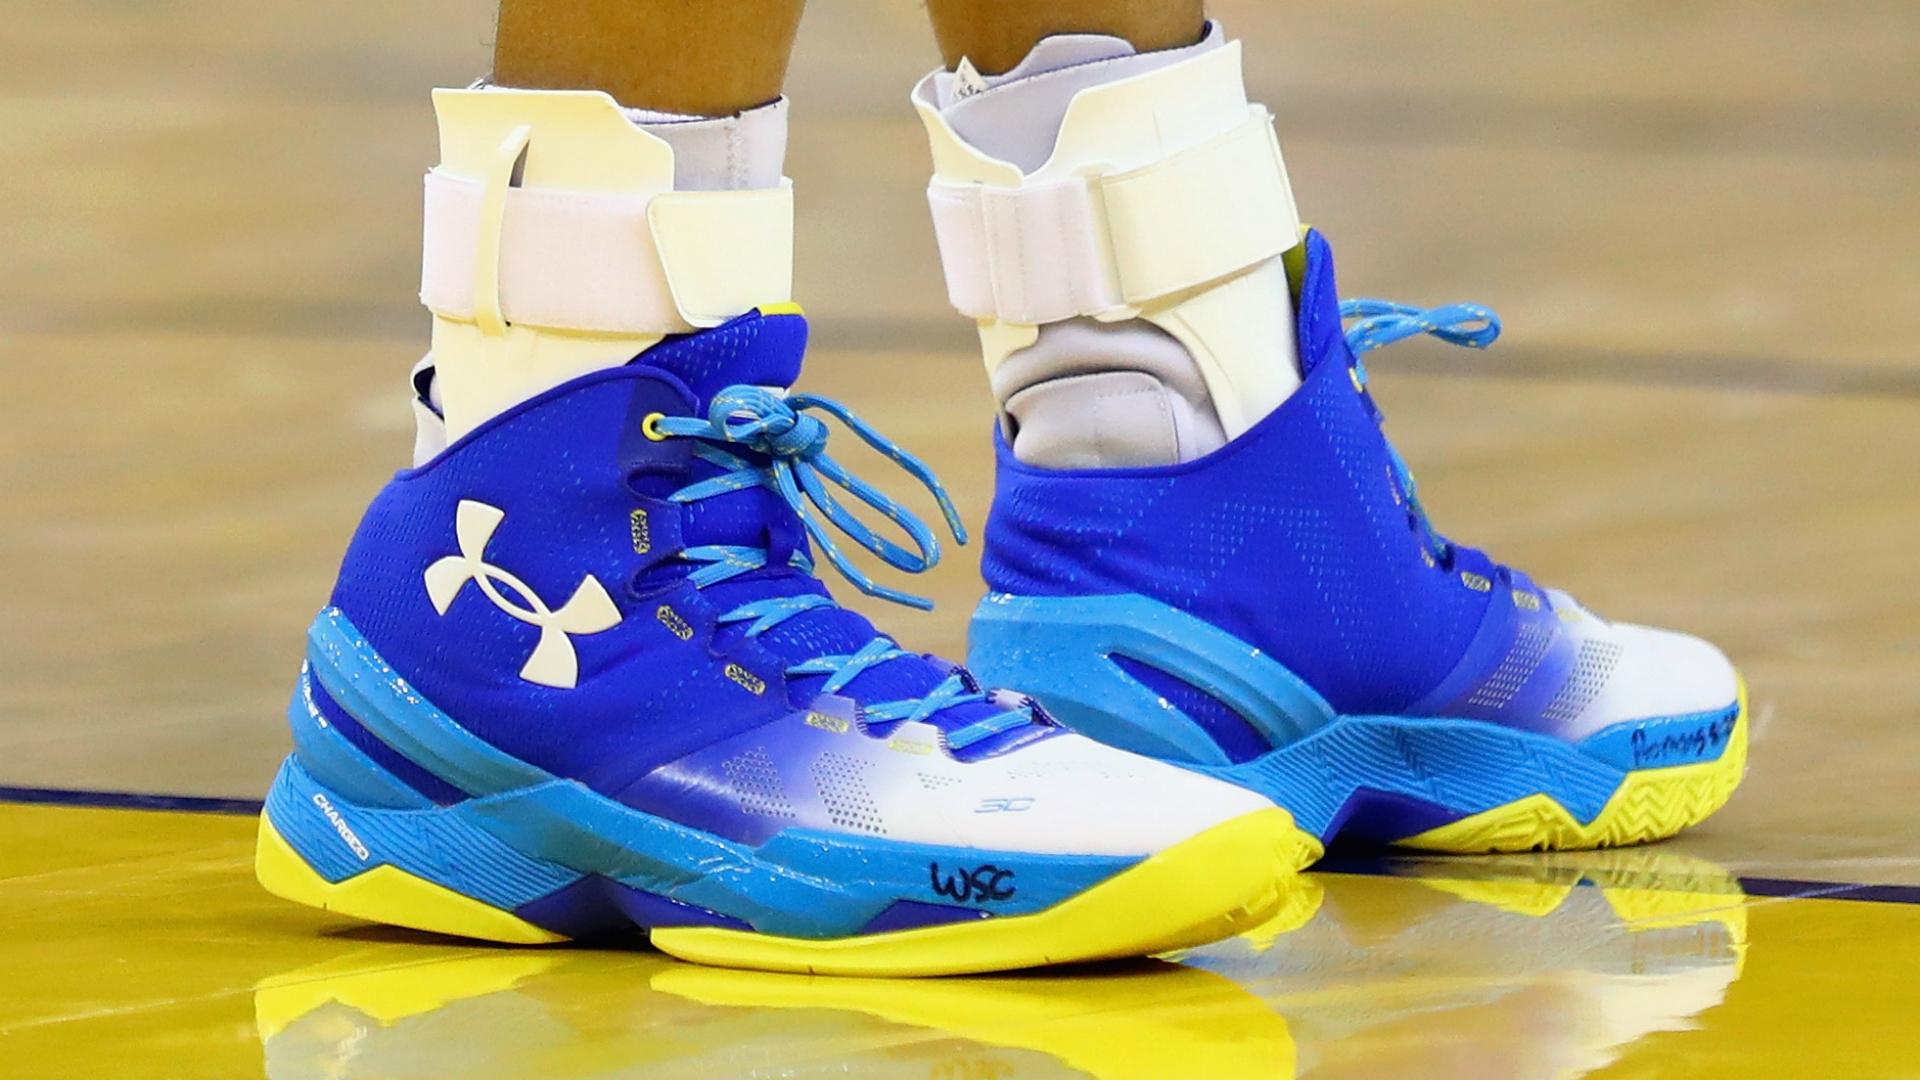 stephen curry shoes writing nike kd 5